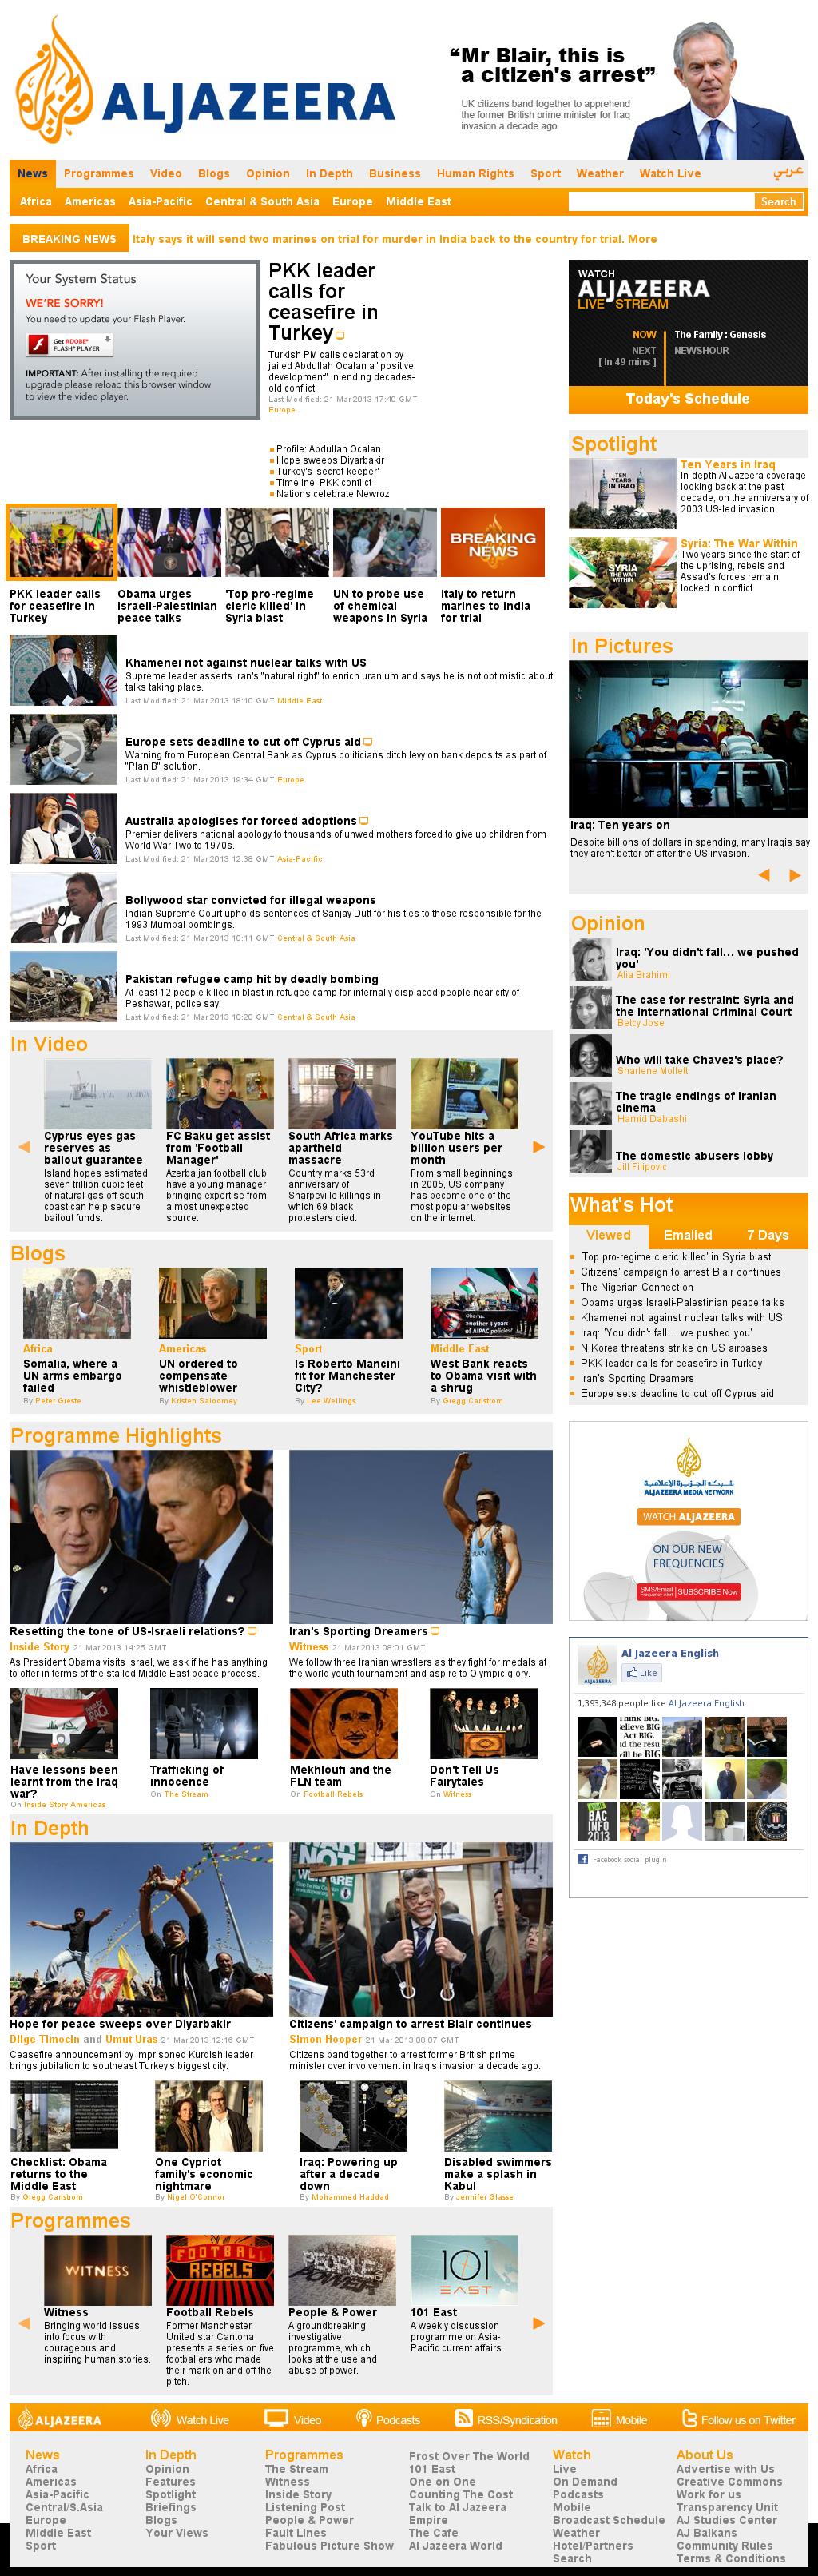 Al Jazeera (English) at Thursday March 21, 2013, 8:11 p.m. UTC